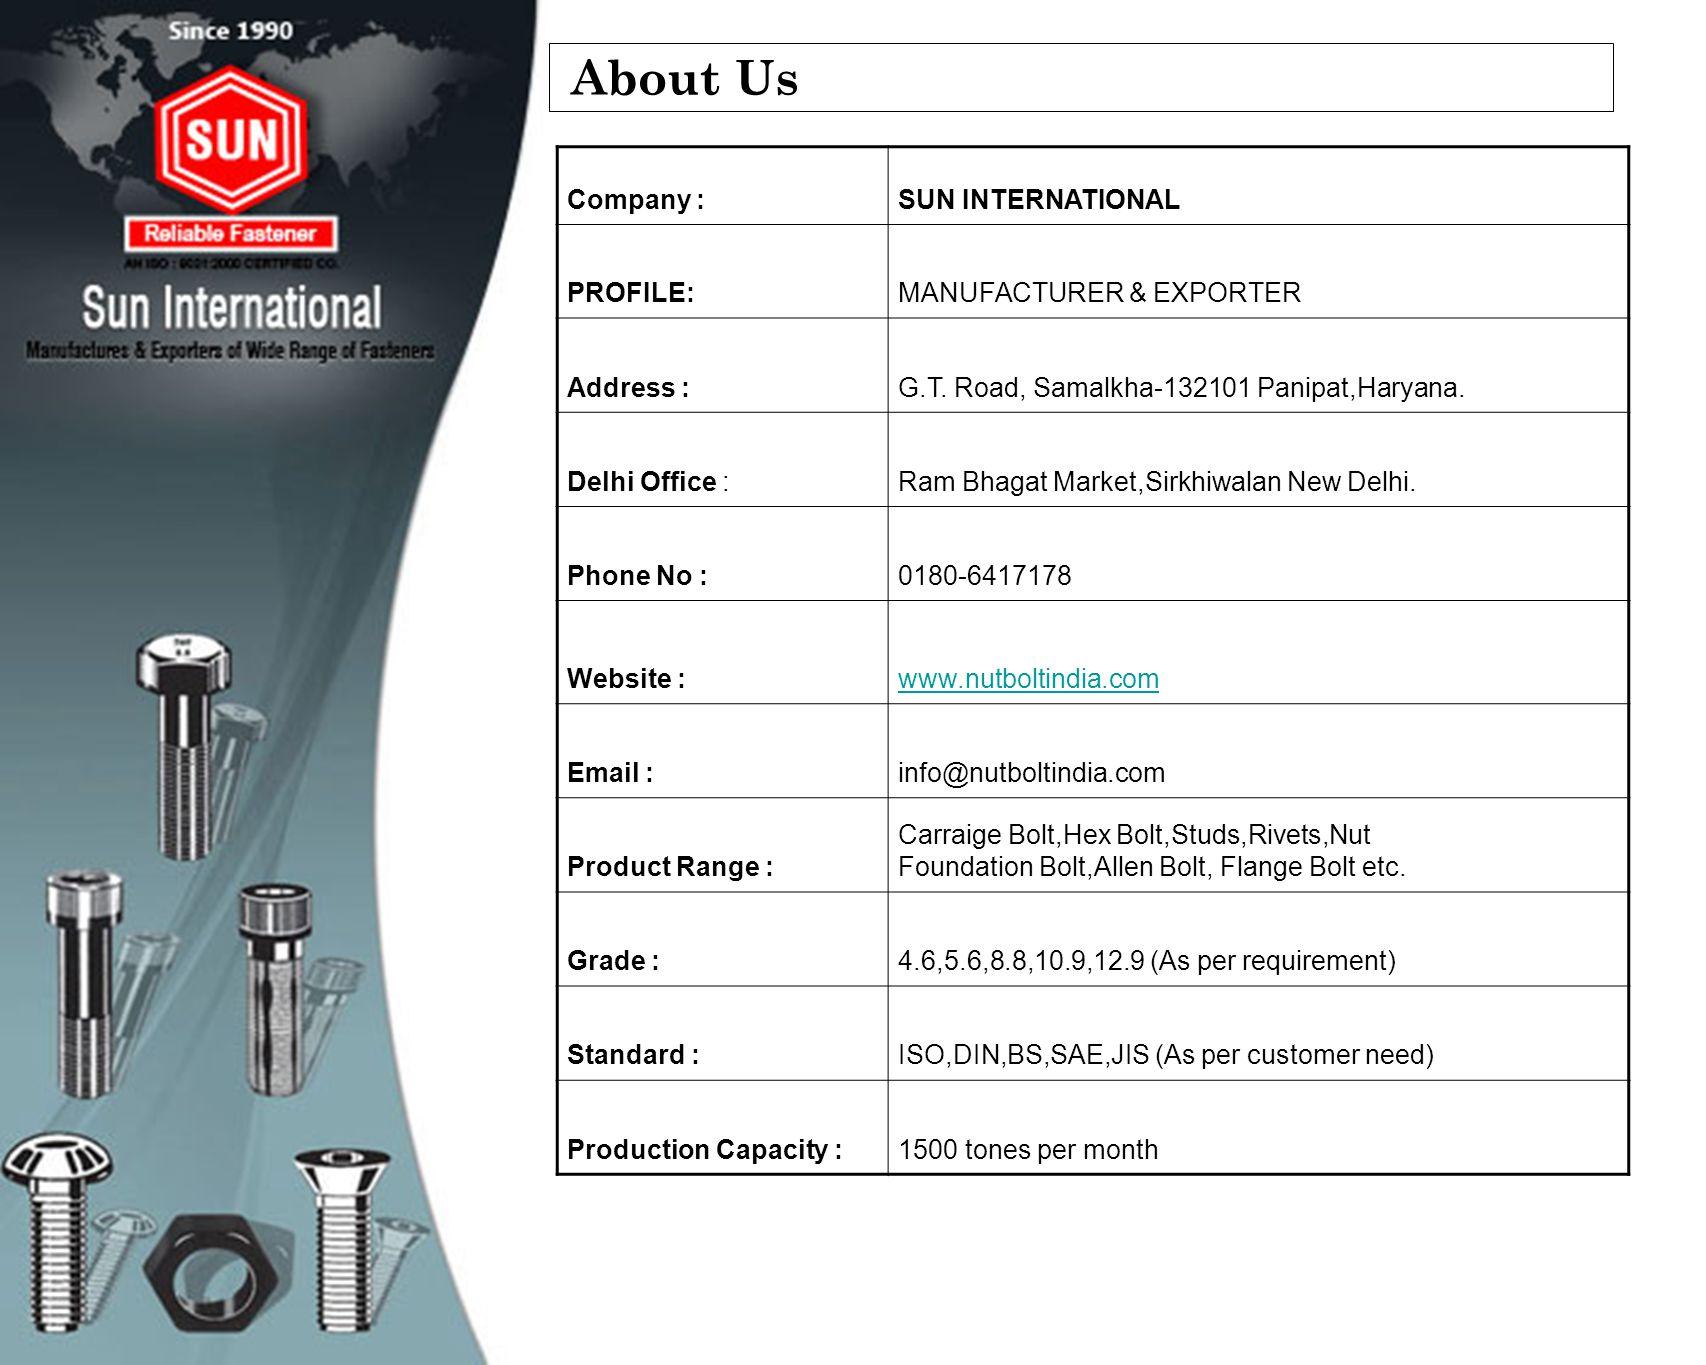 About Us Company : SUN INTERNATIONAL PROFILE: MANUFACTURER & EXPORTER